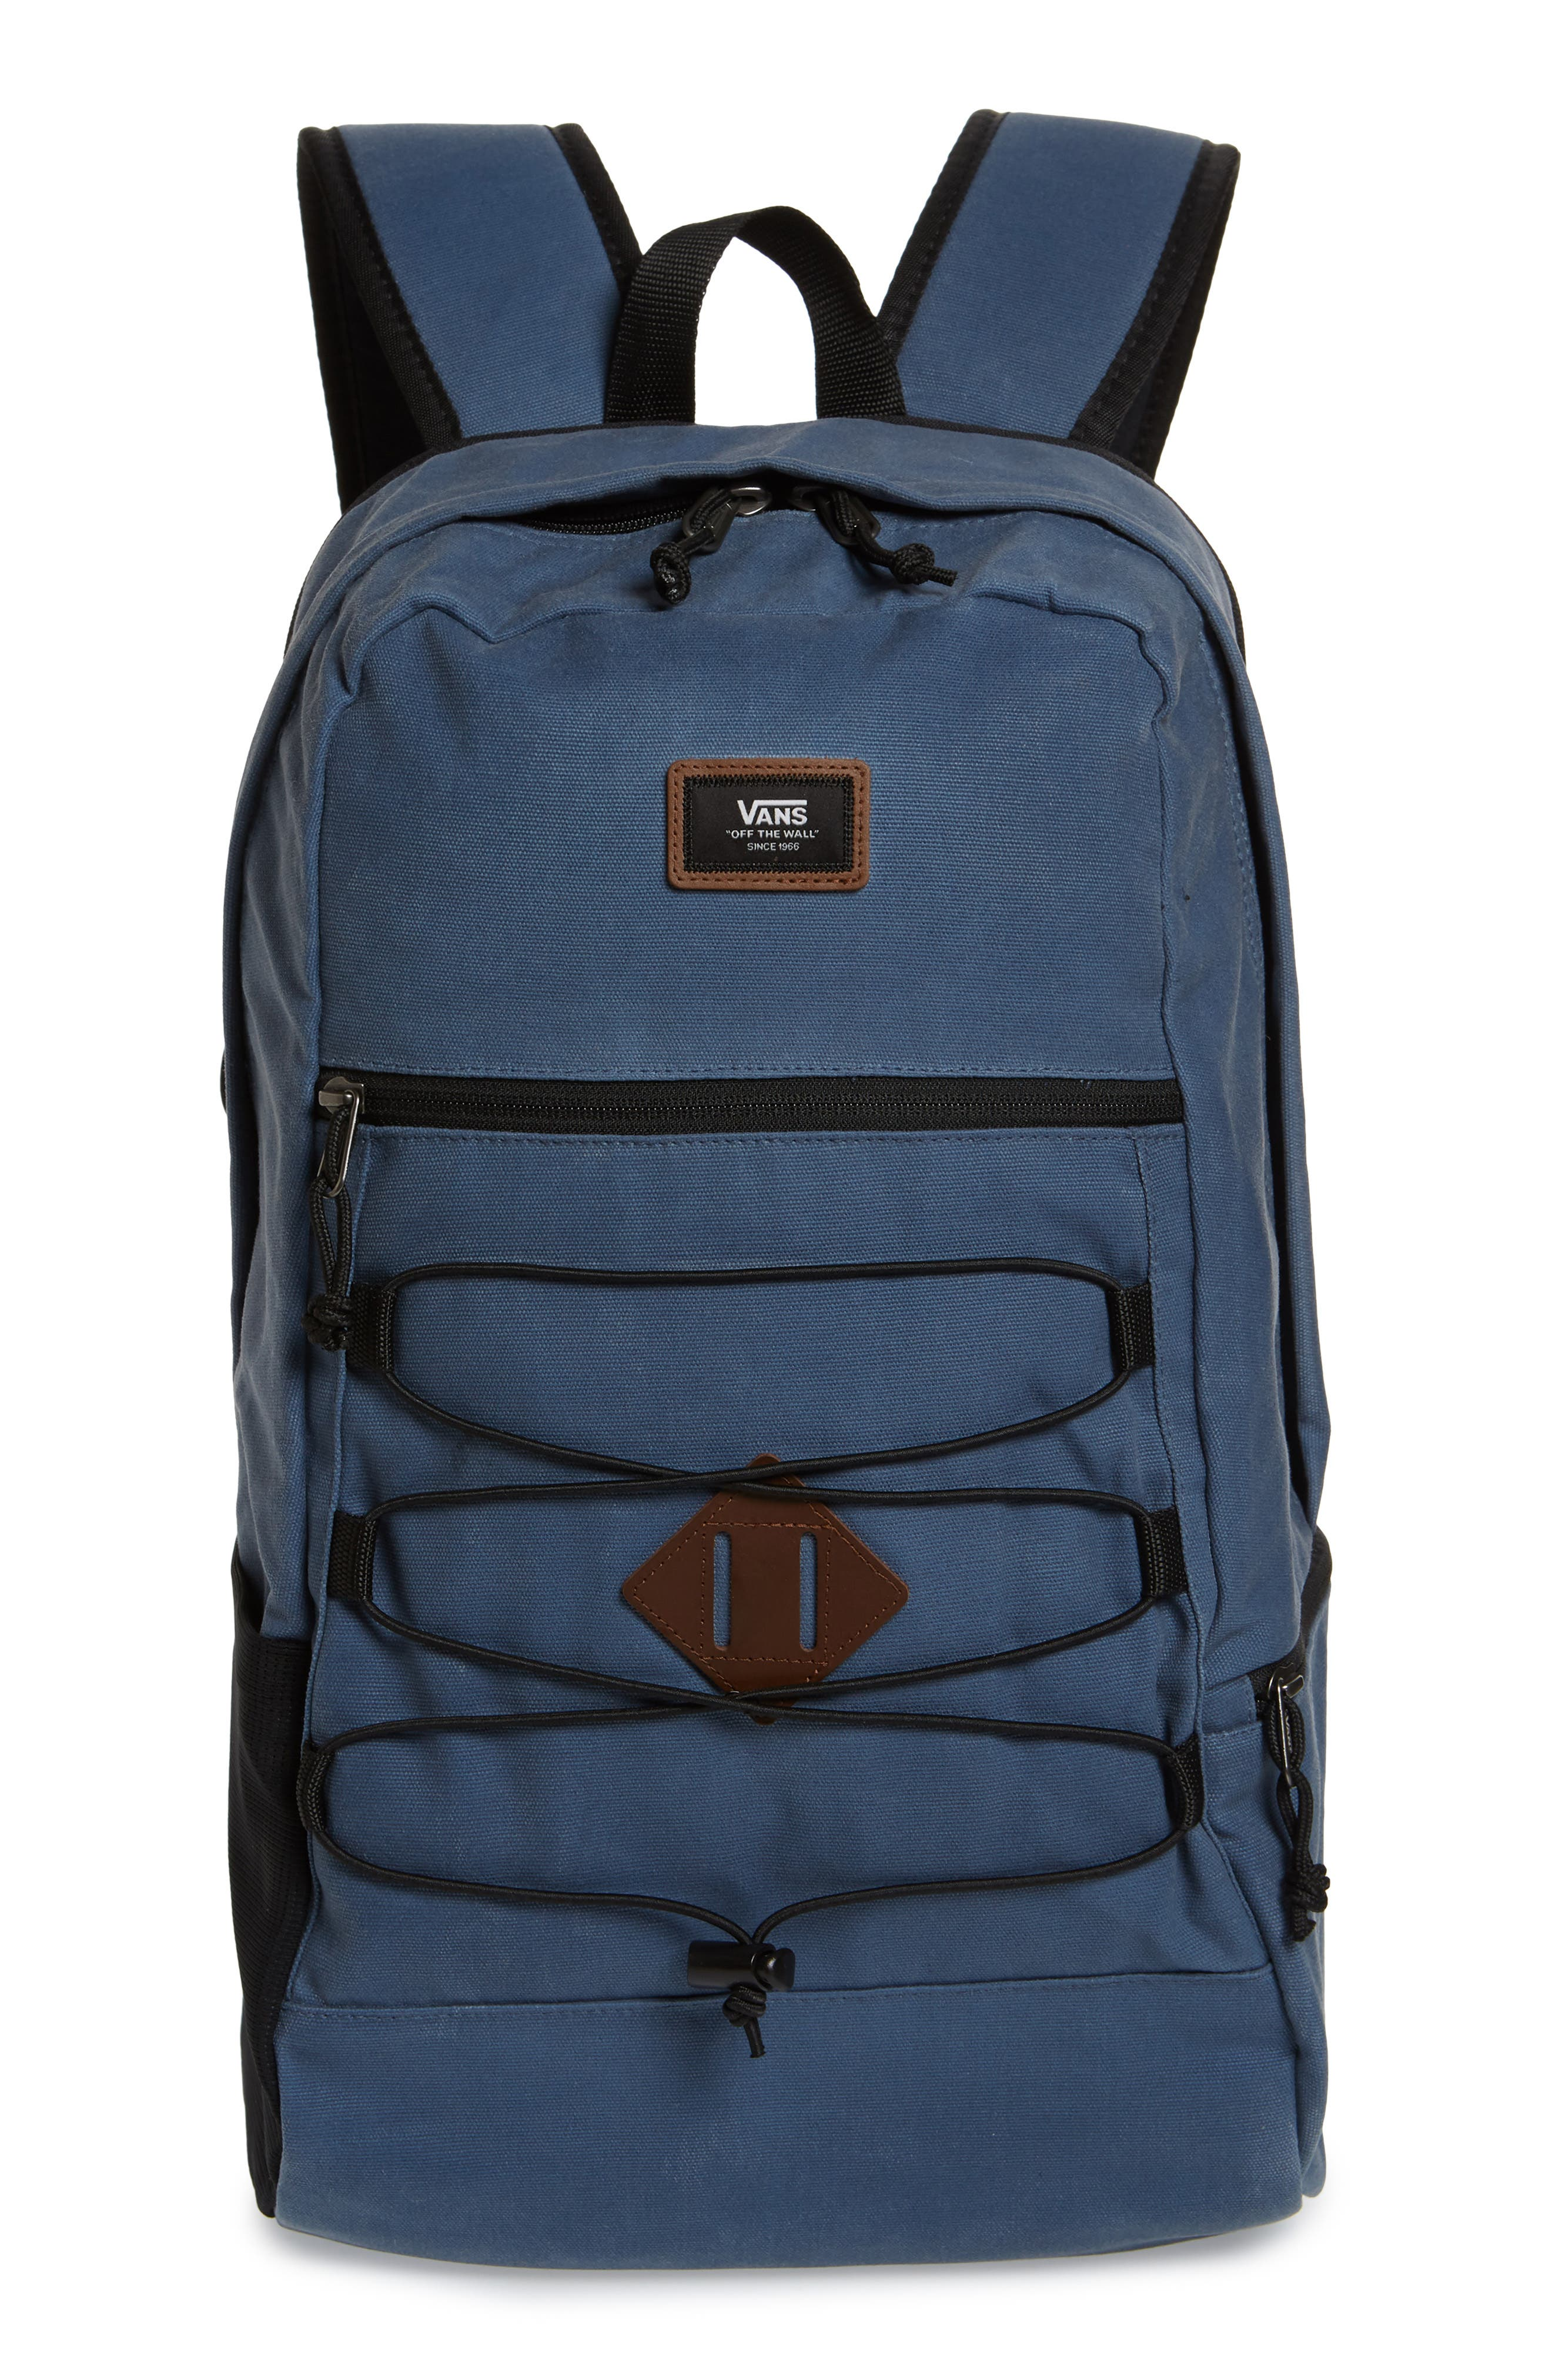 be9258b0dd2ce9 Men s Vans Bags   Backpacks